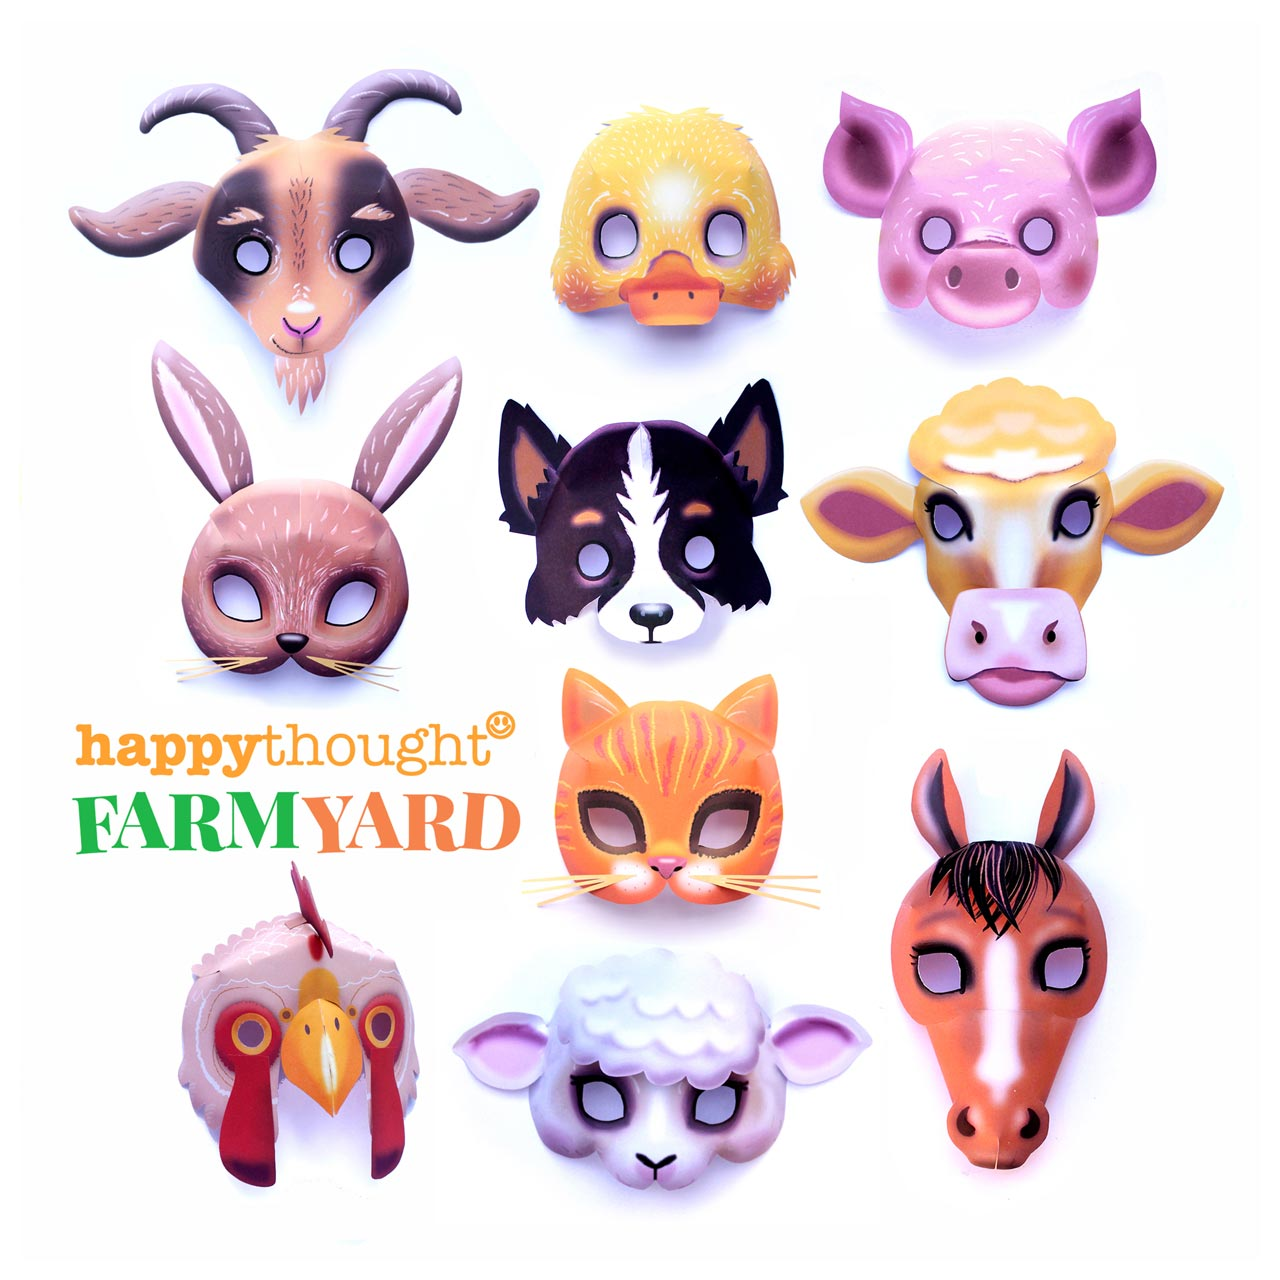 Animal Paper Crafts Templates